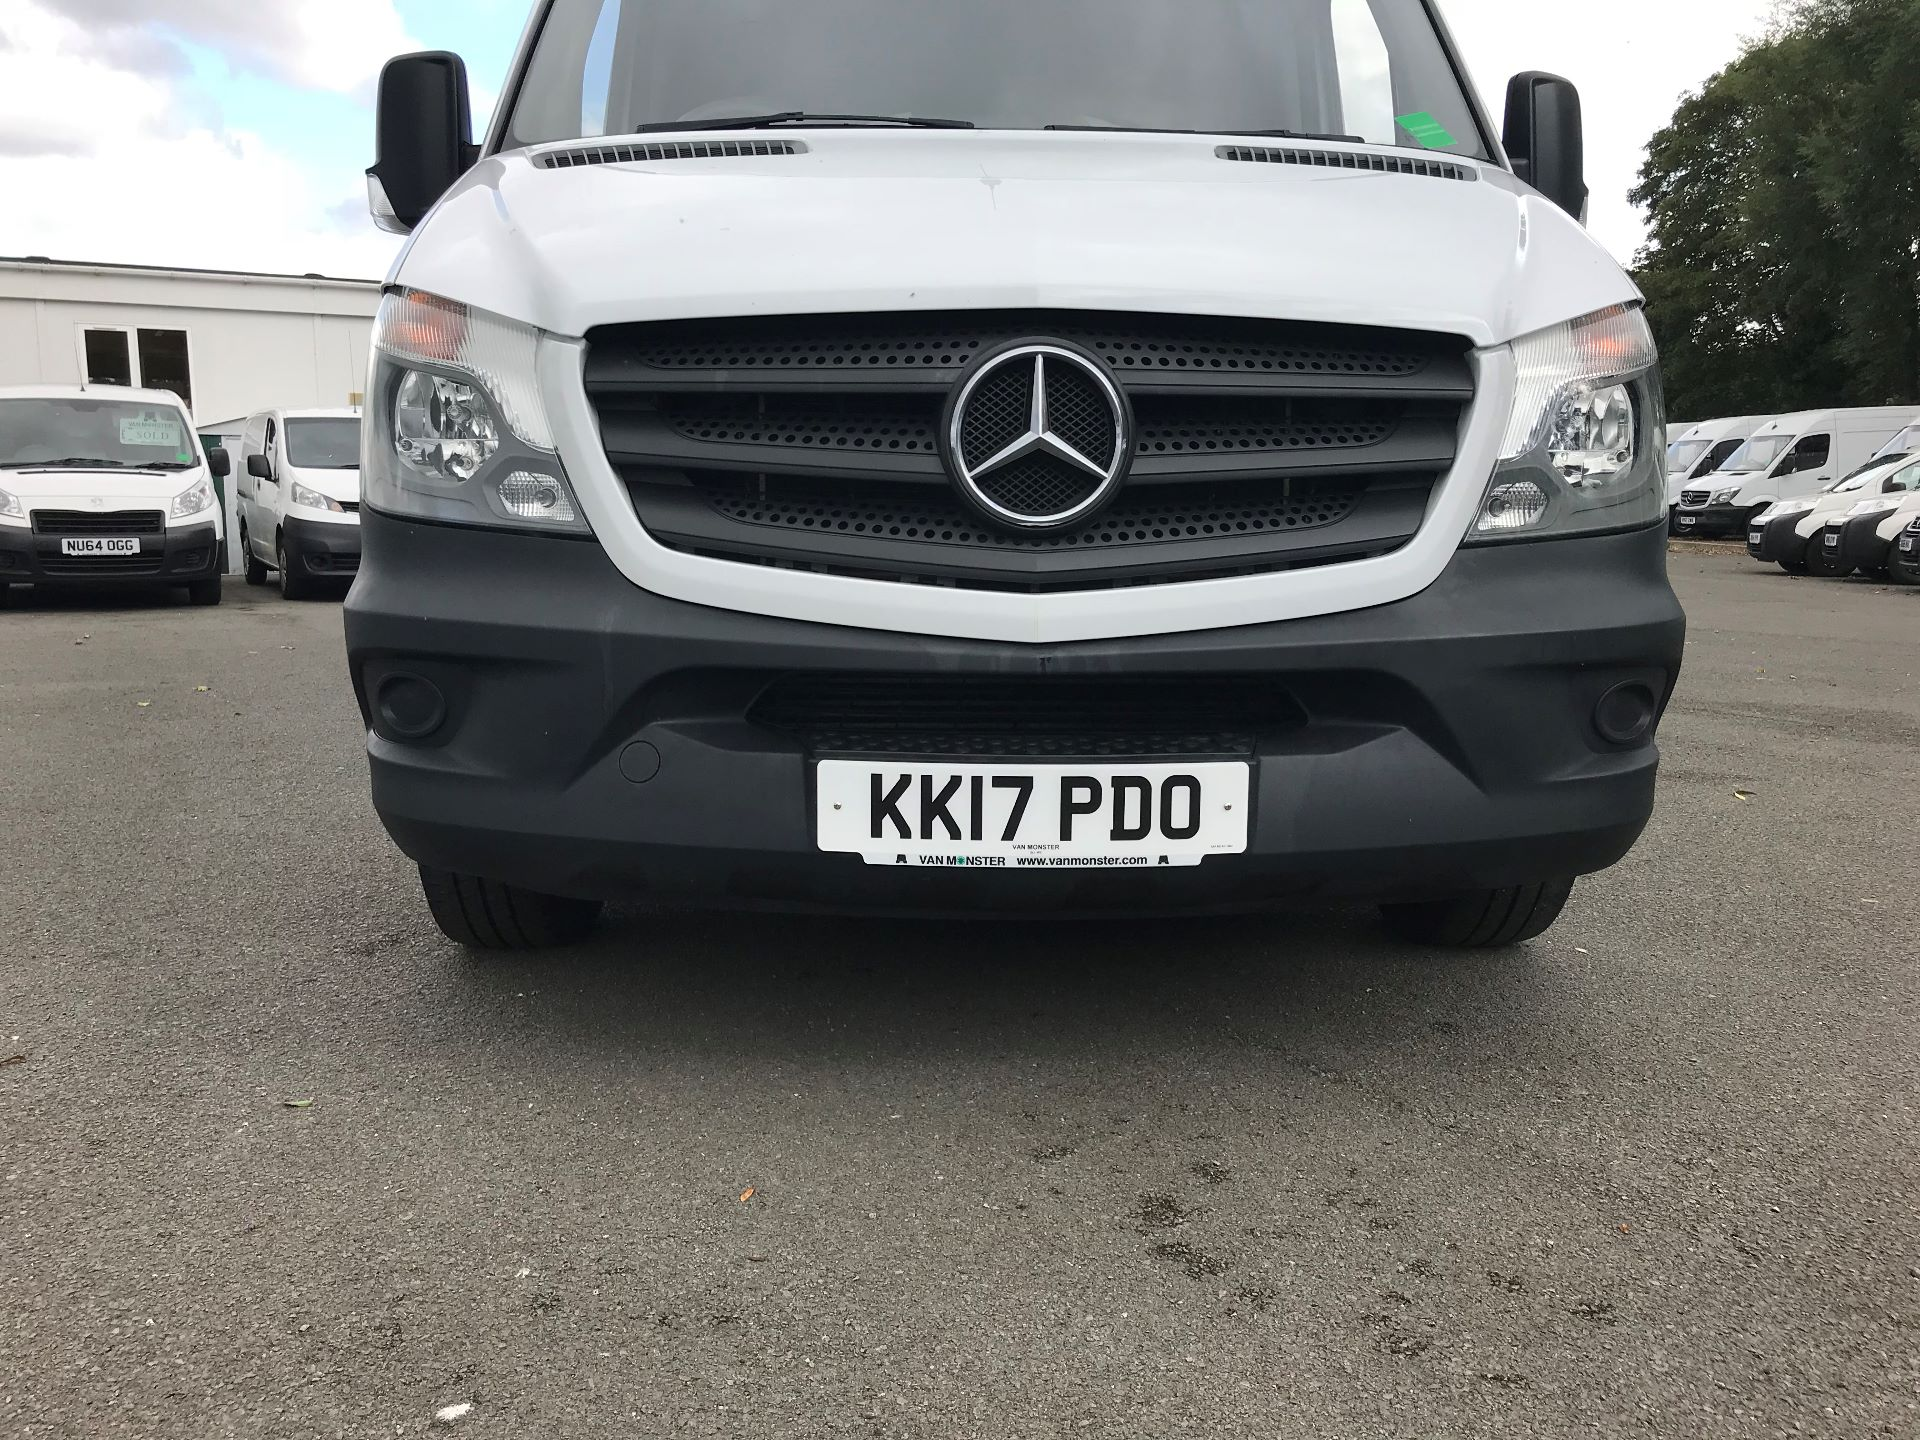 2017 Mercedes-Benz Sprinter  314 LWB H/R VAN EURO 6 (KK17PDO) Image 13